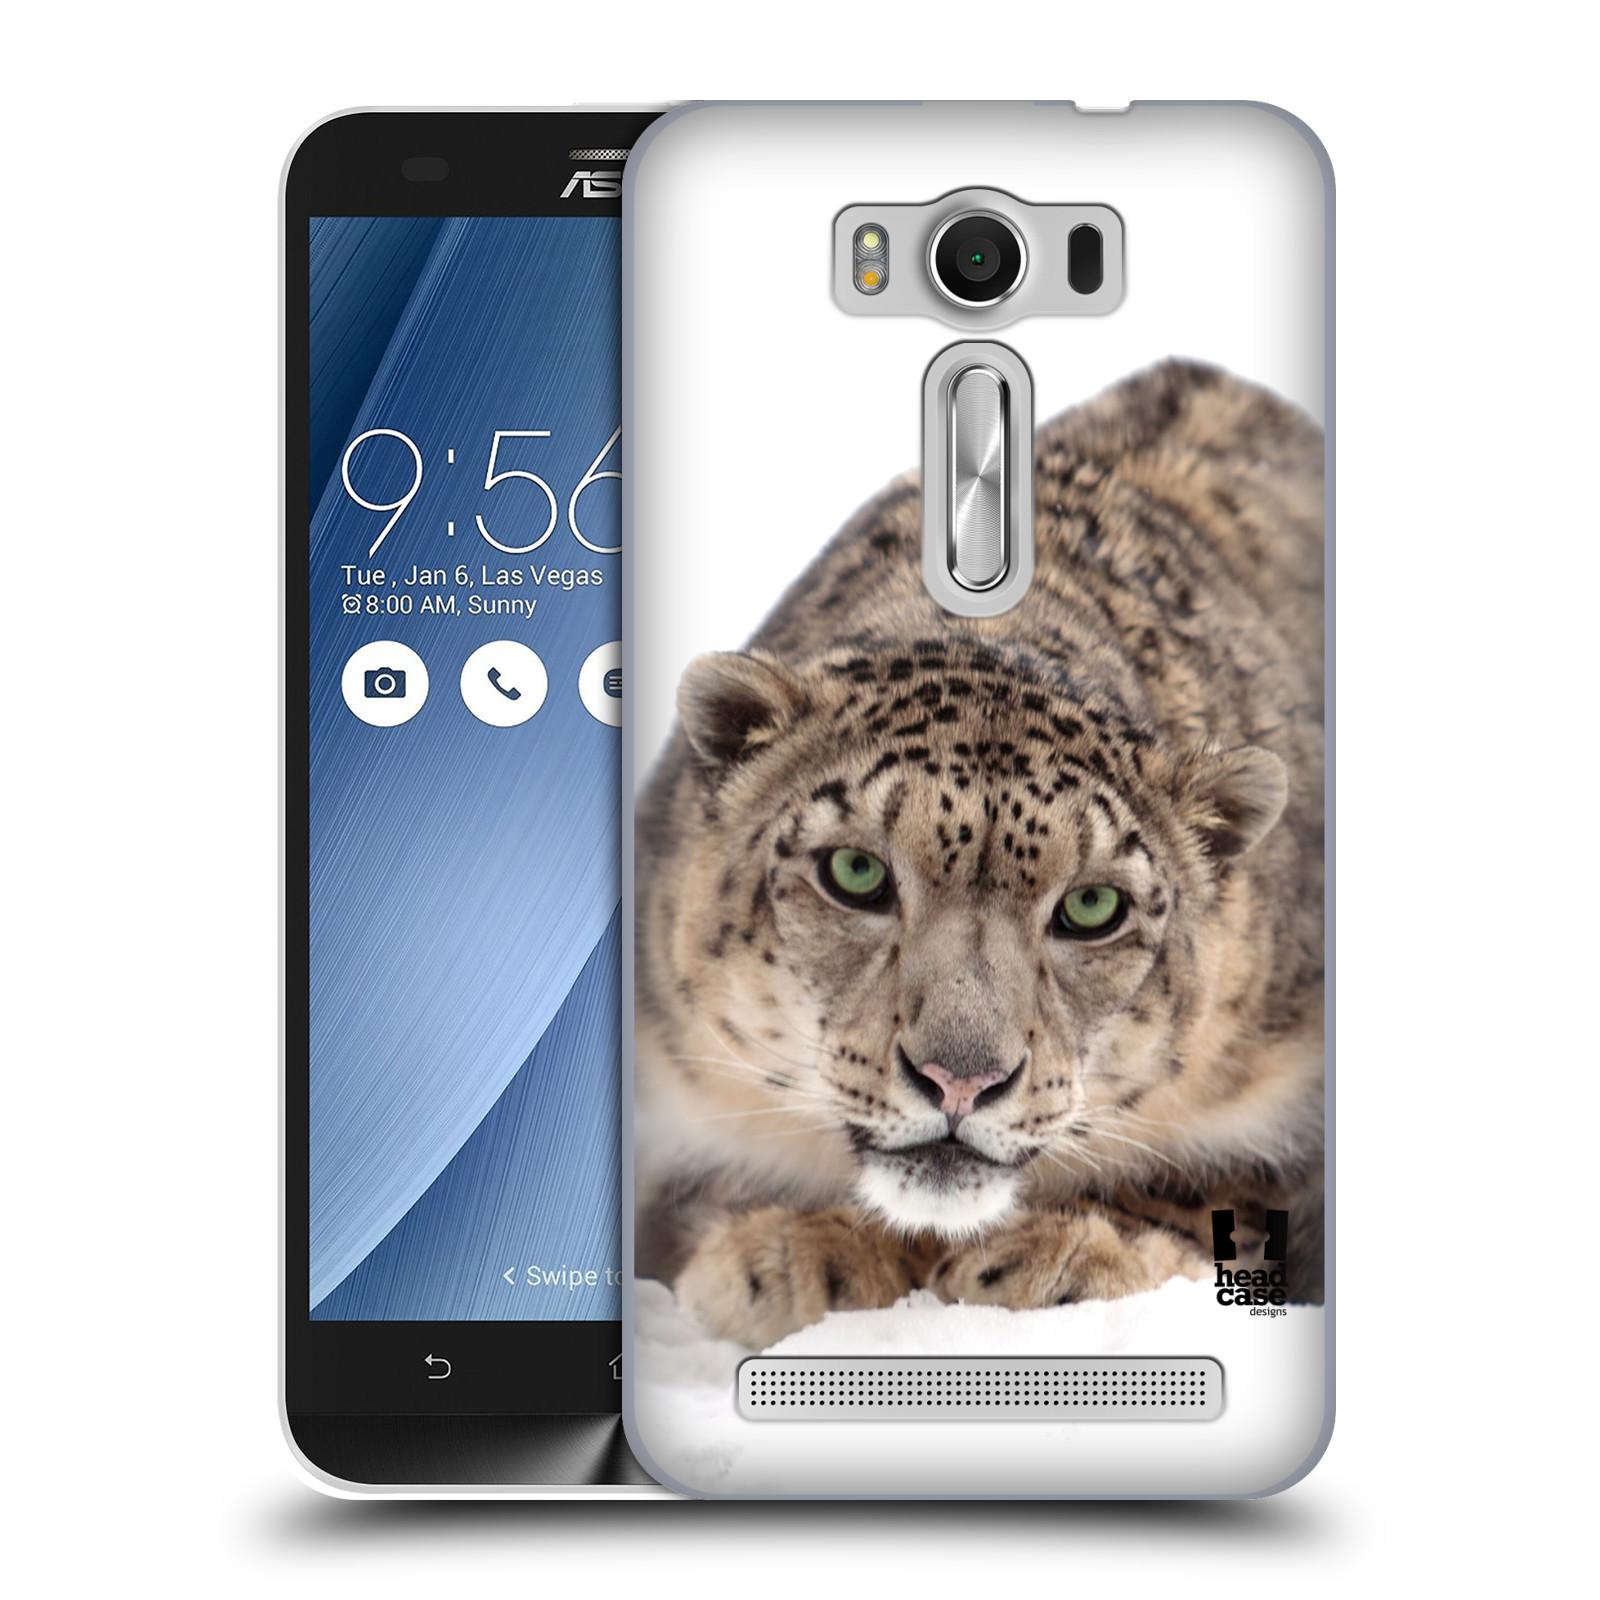 "HEAD CASE plastový obal na mobil Asus Zenfone 2 LASER (5"" displej ZE500KL) vzor Divočina, Divoký život a zvířata foto SNĚŽNÝ LEOPARD"